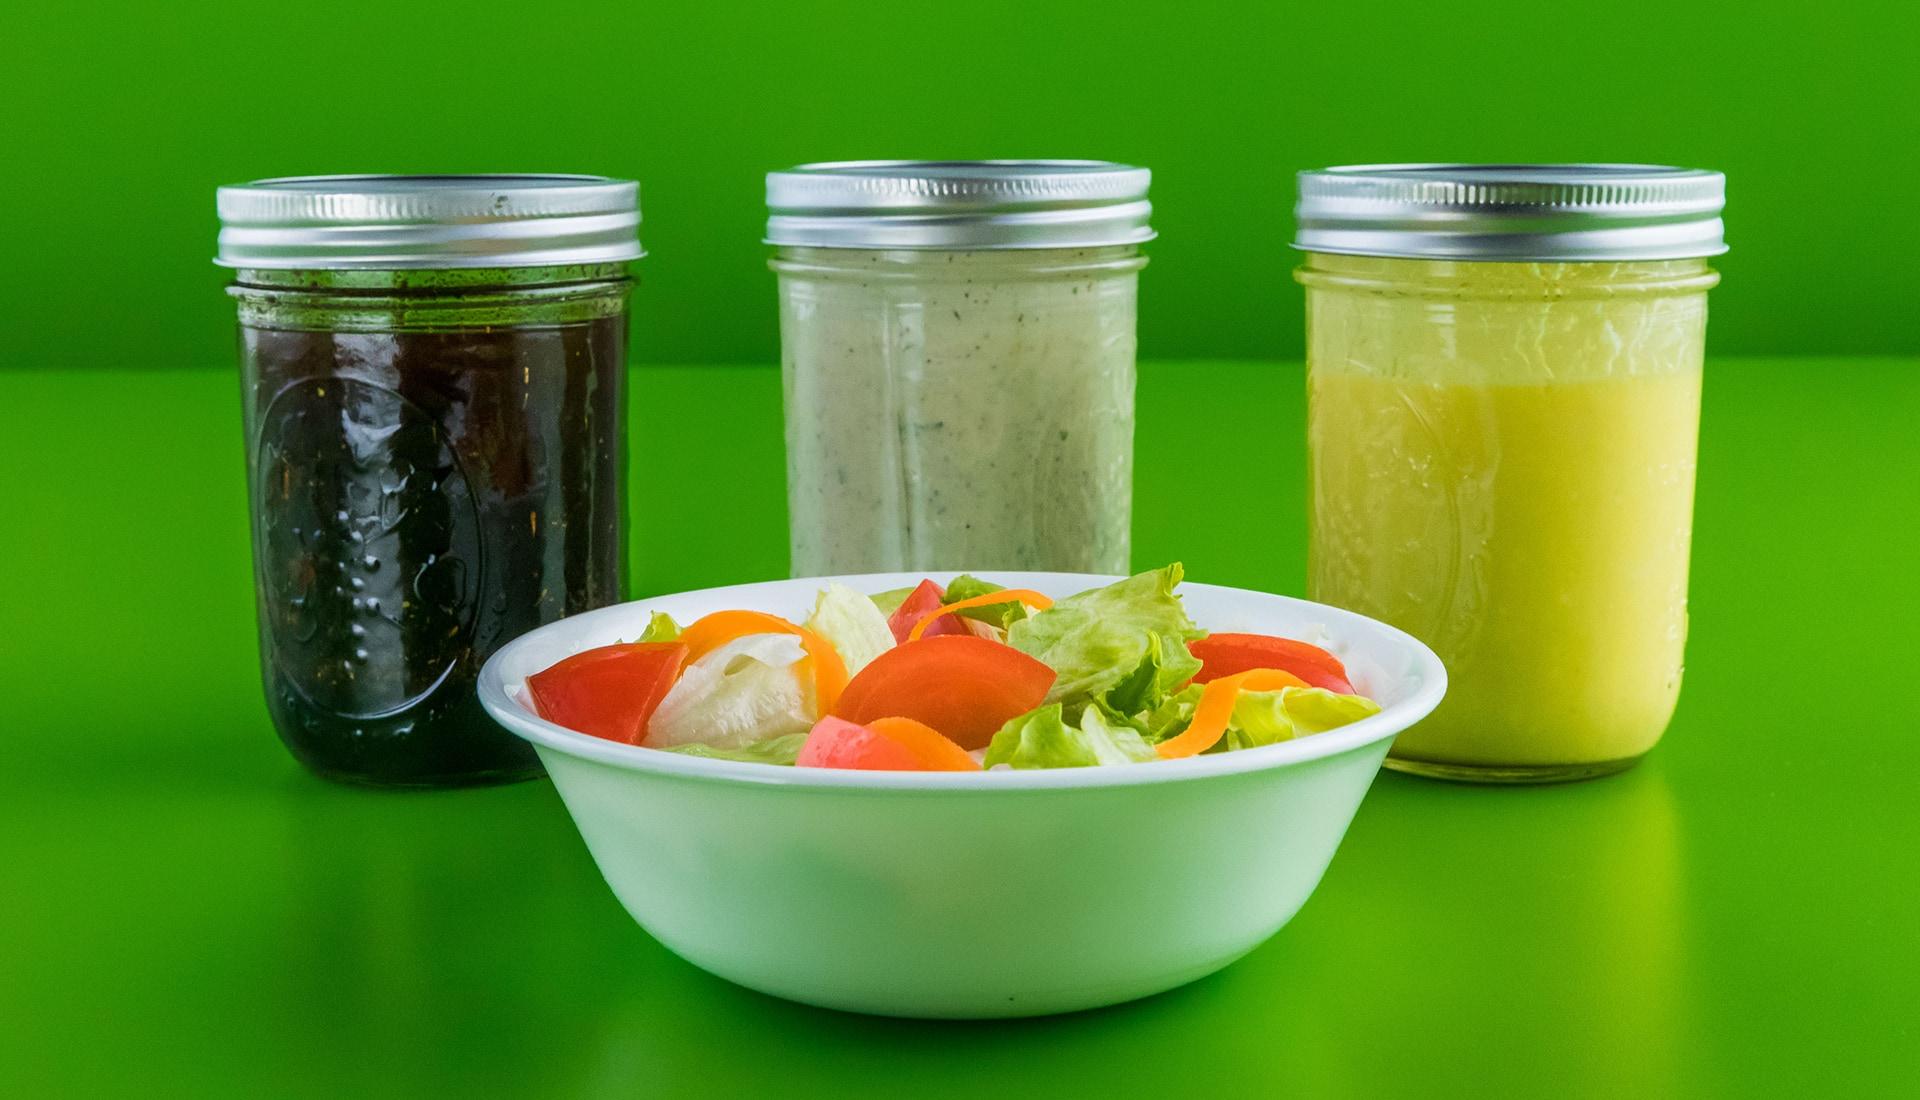 Three jars of salad dressing placed behind a bowl of salad